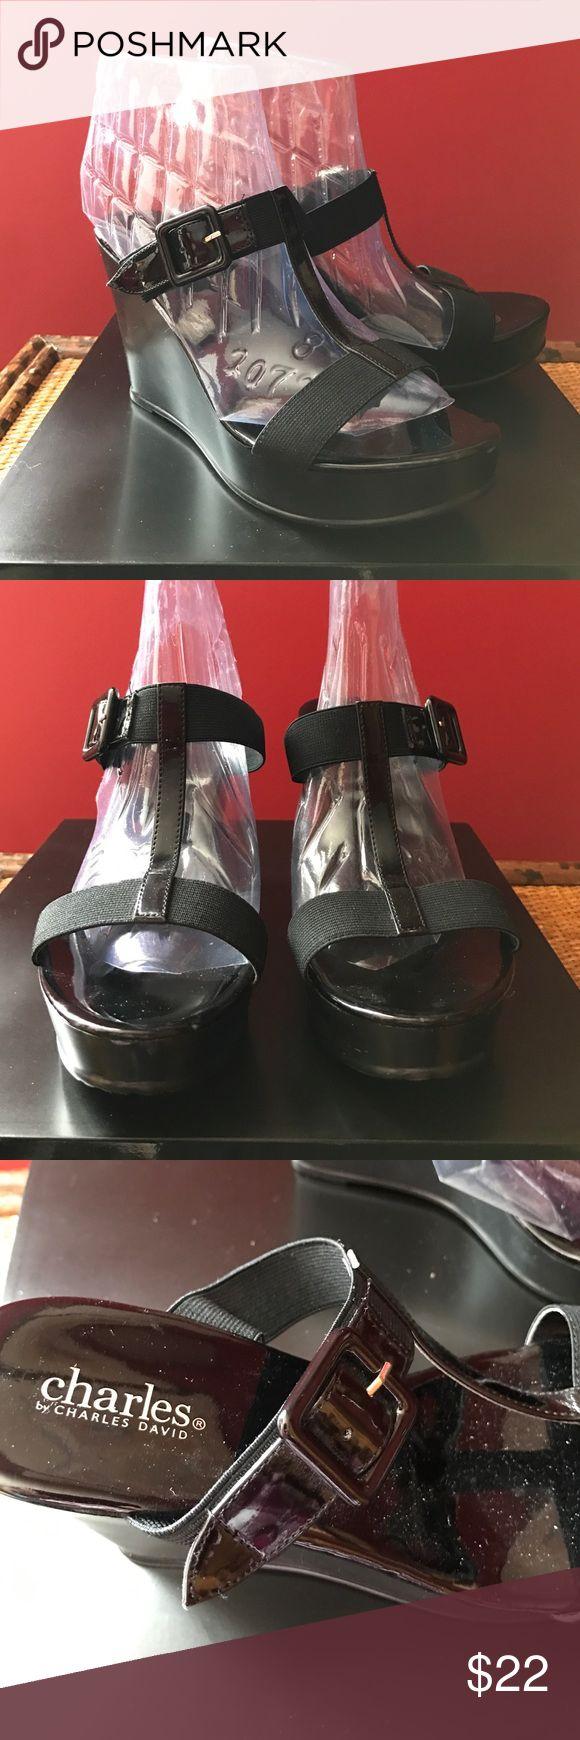 Charles by Charles David wedge Shoes Charles by Charles David Black 4 in. Wedge Heel slides Size 8 Gently Worn Charles David Shoes Wedges